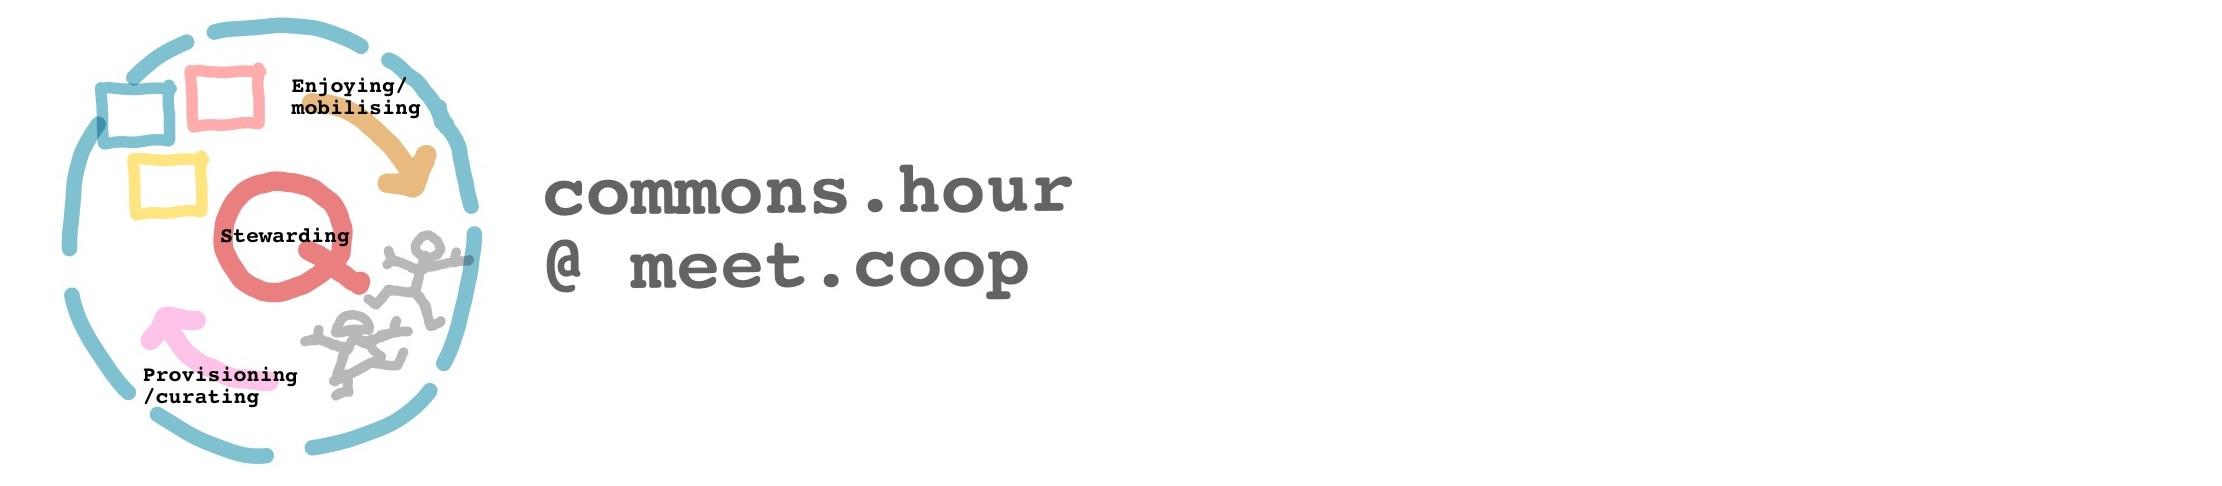 commons.hour-logo